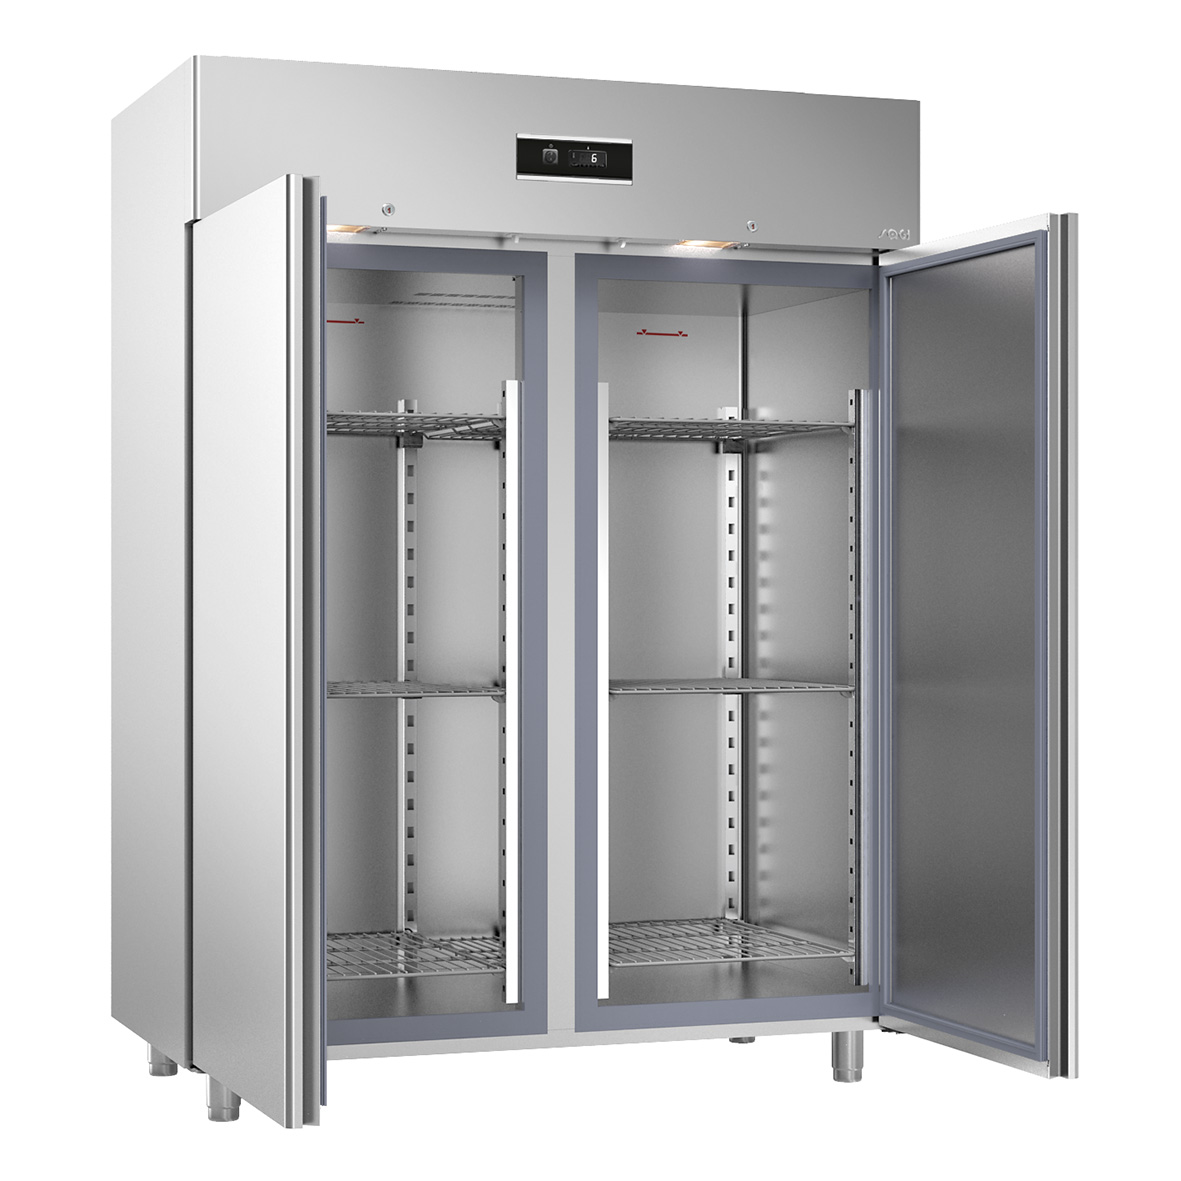 Sagi-Freezer-For-Sale-In-UAE